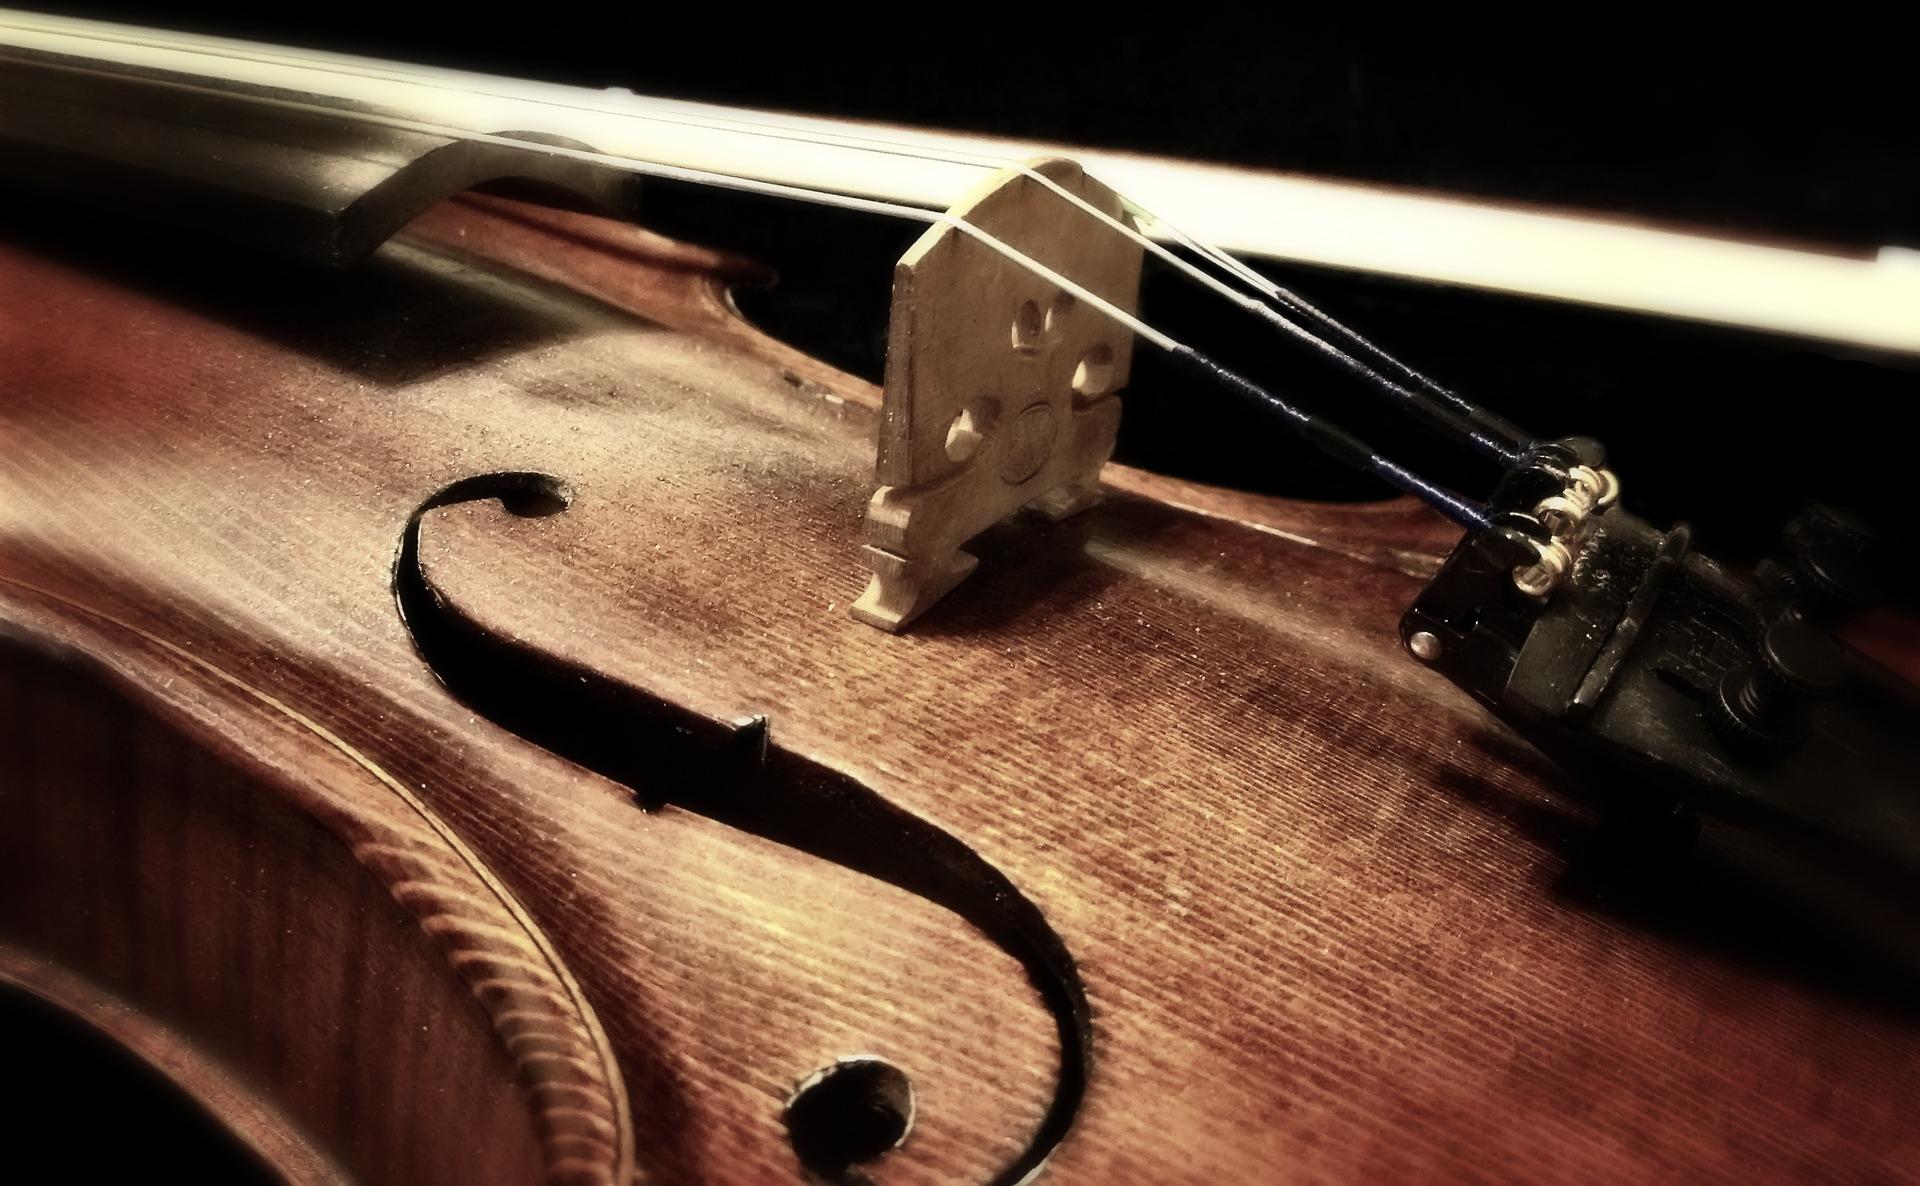 Music and creativity